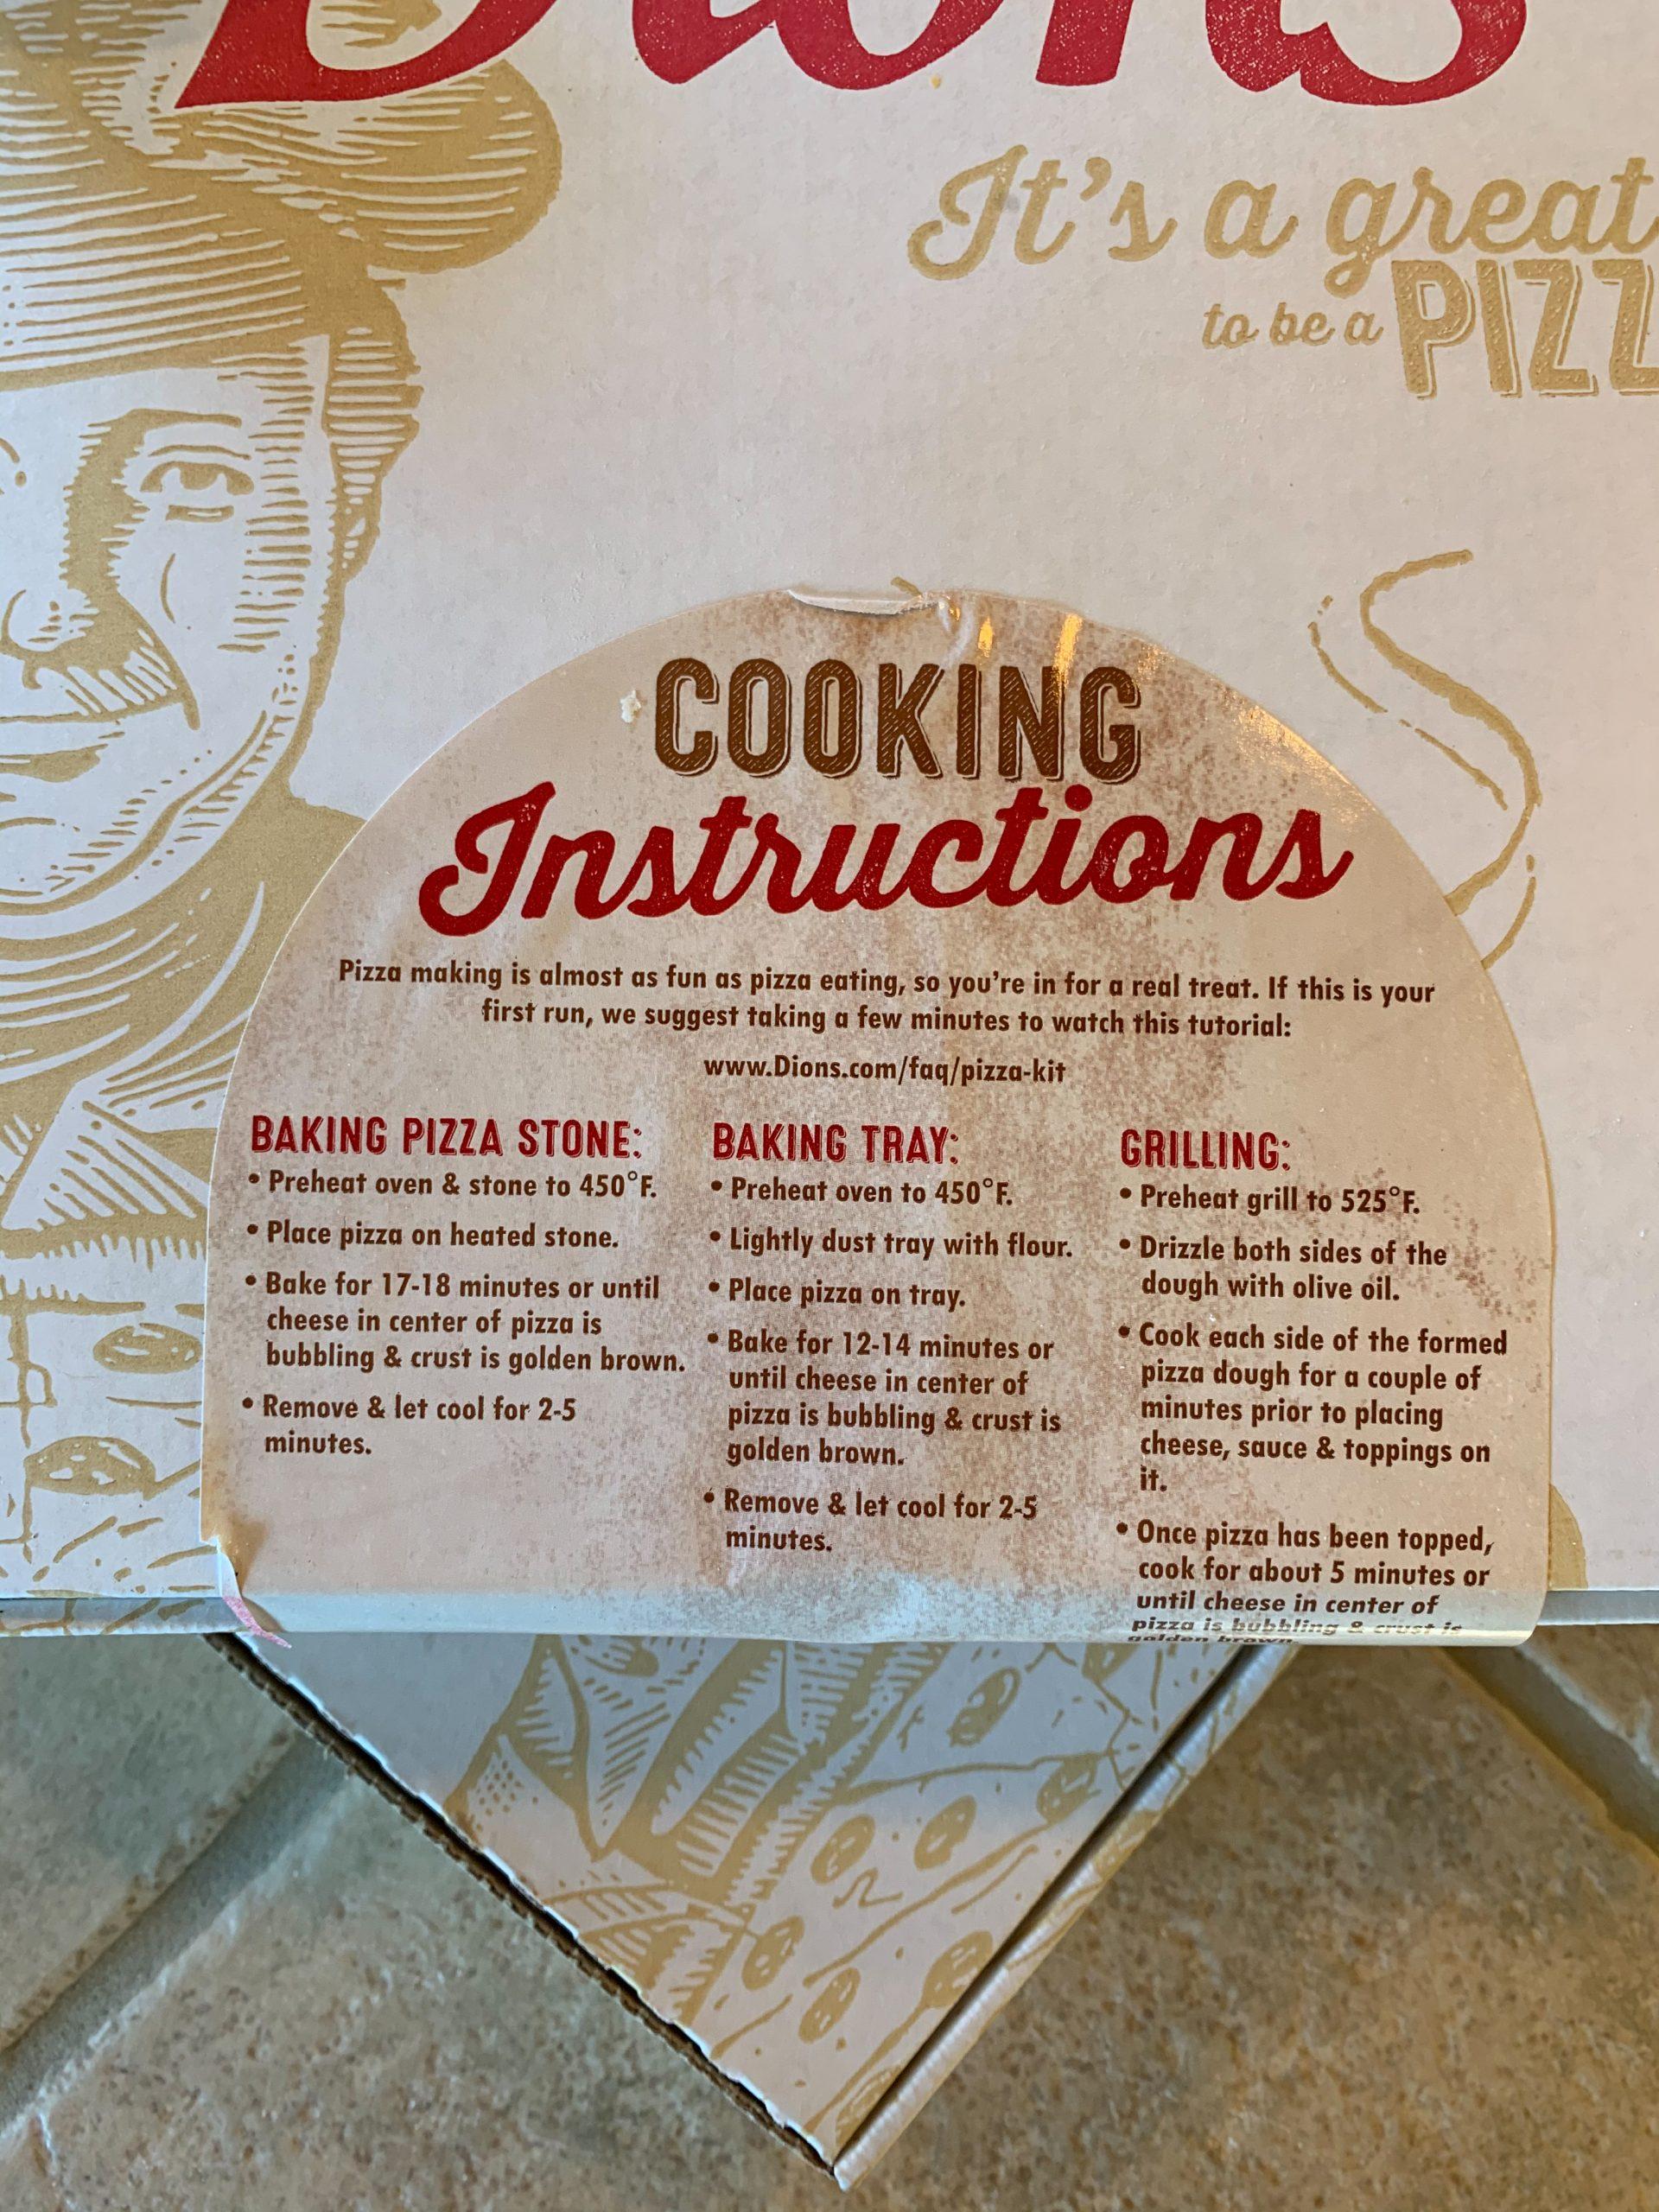 dion's pizza kits